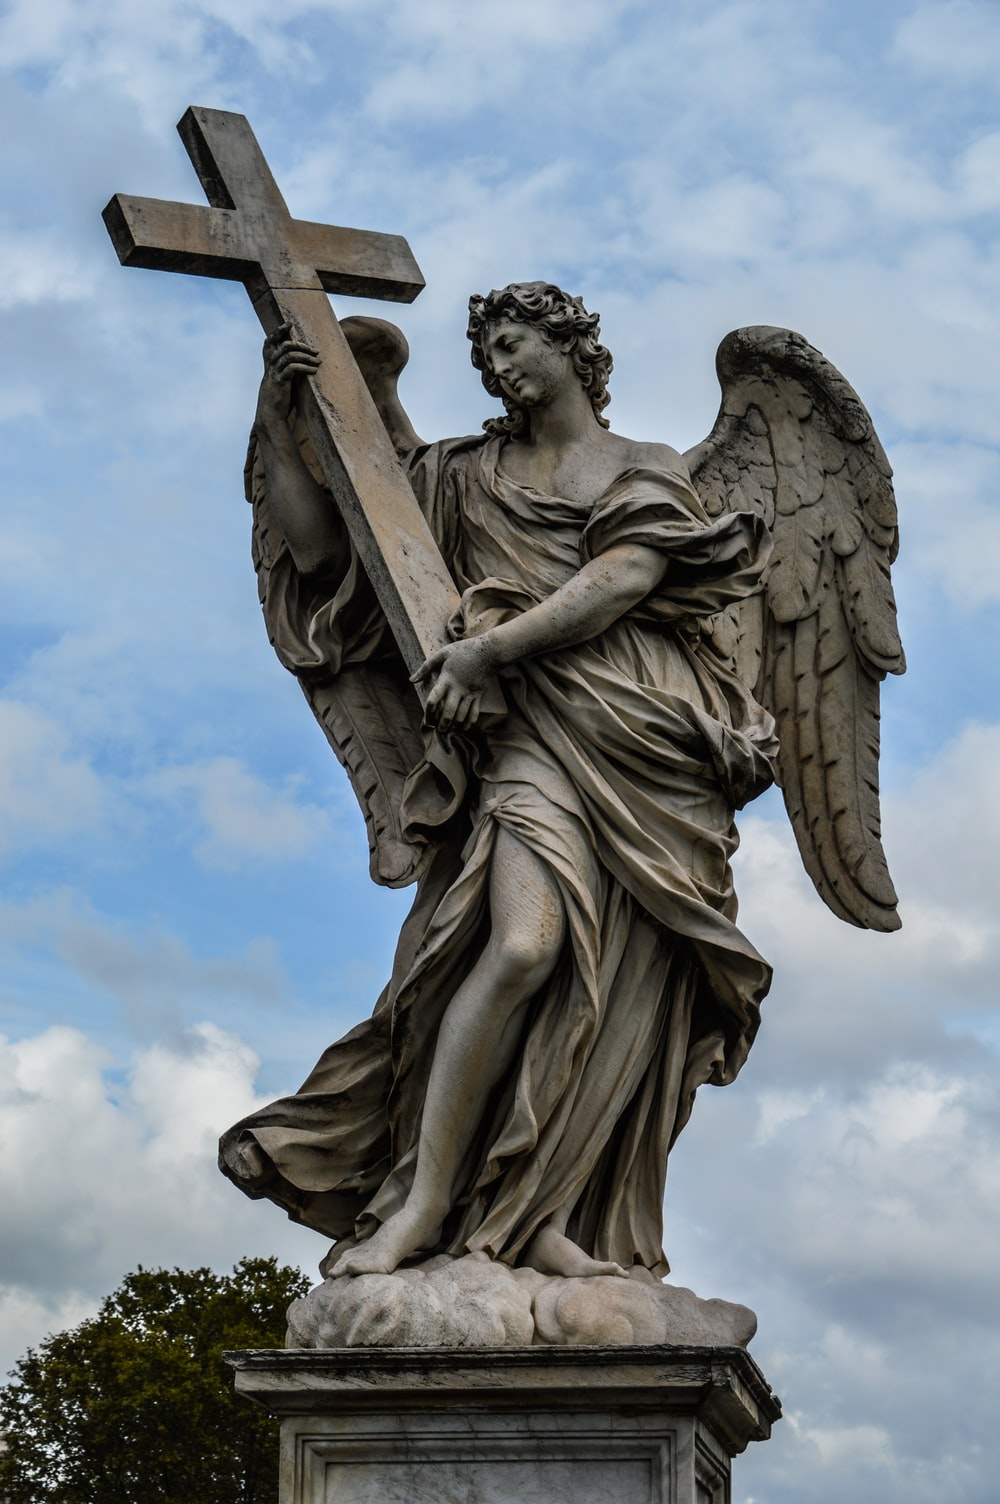 angel statue under white clouds during daytime